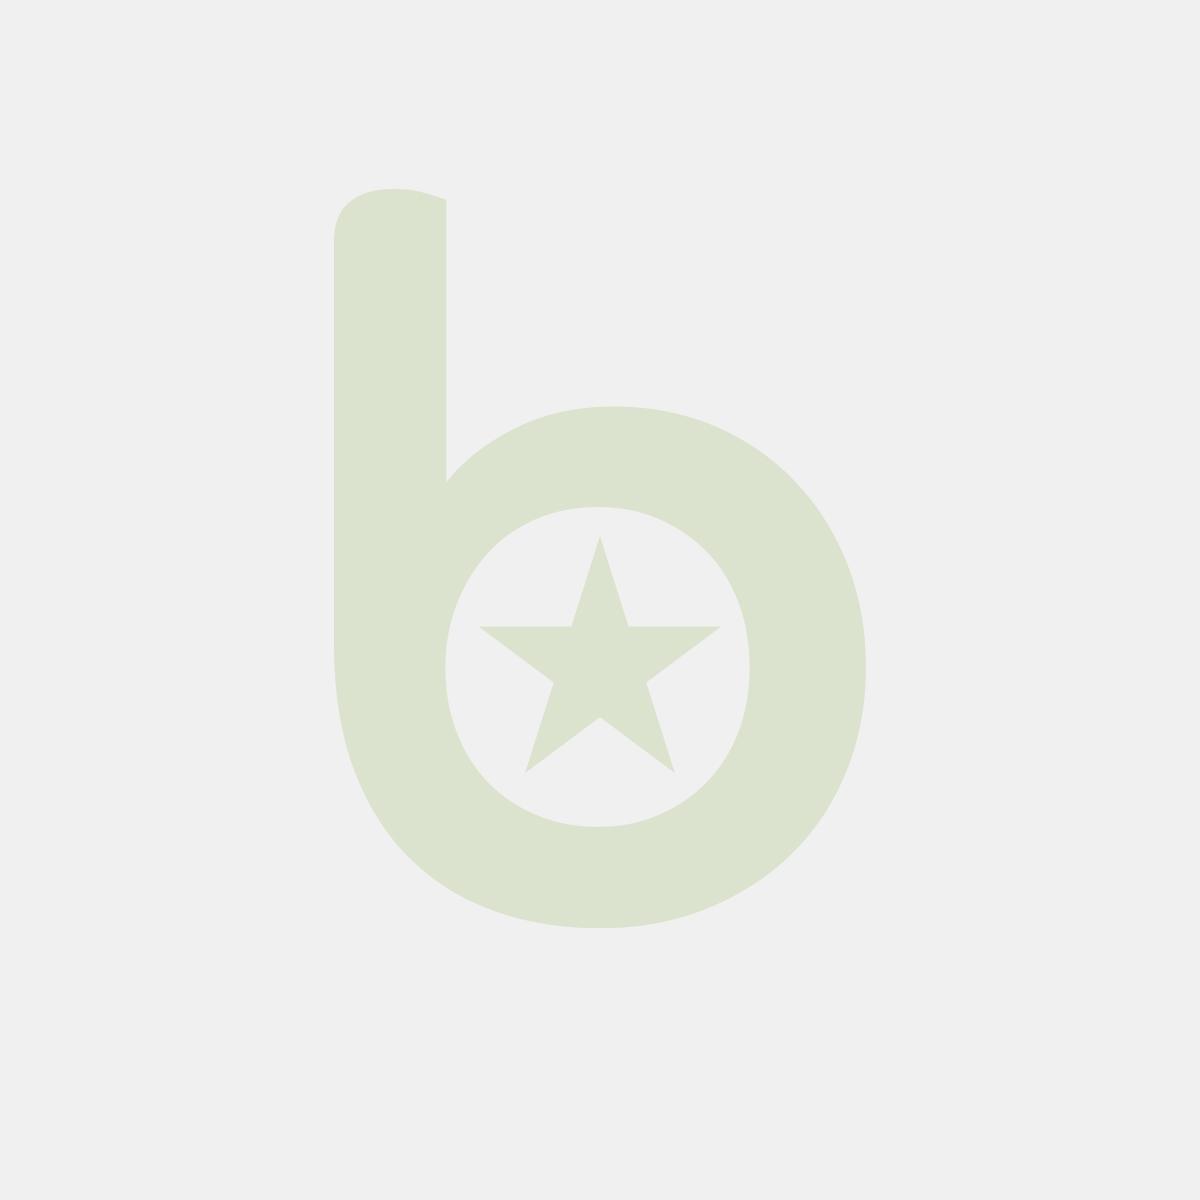 Pucharek FINGERFOOD transparentny, szer/dł/wys: 5,7/5,8/5,7 cm PS, 25 szt. w opakowaniu